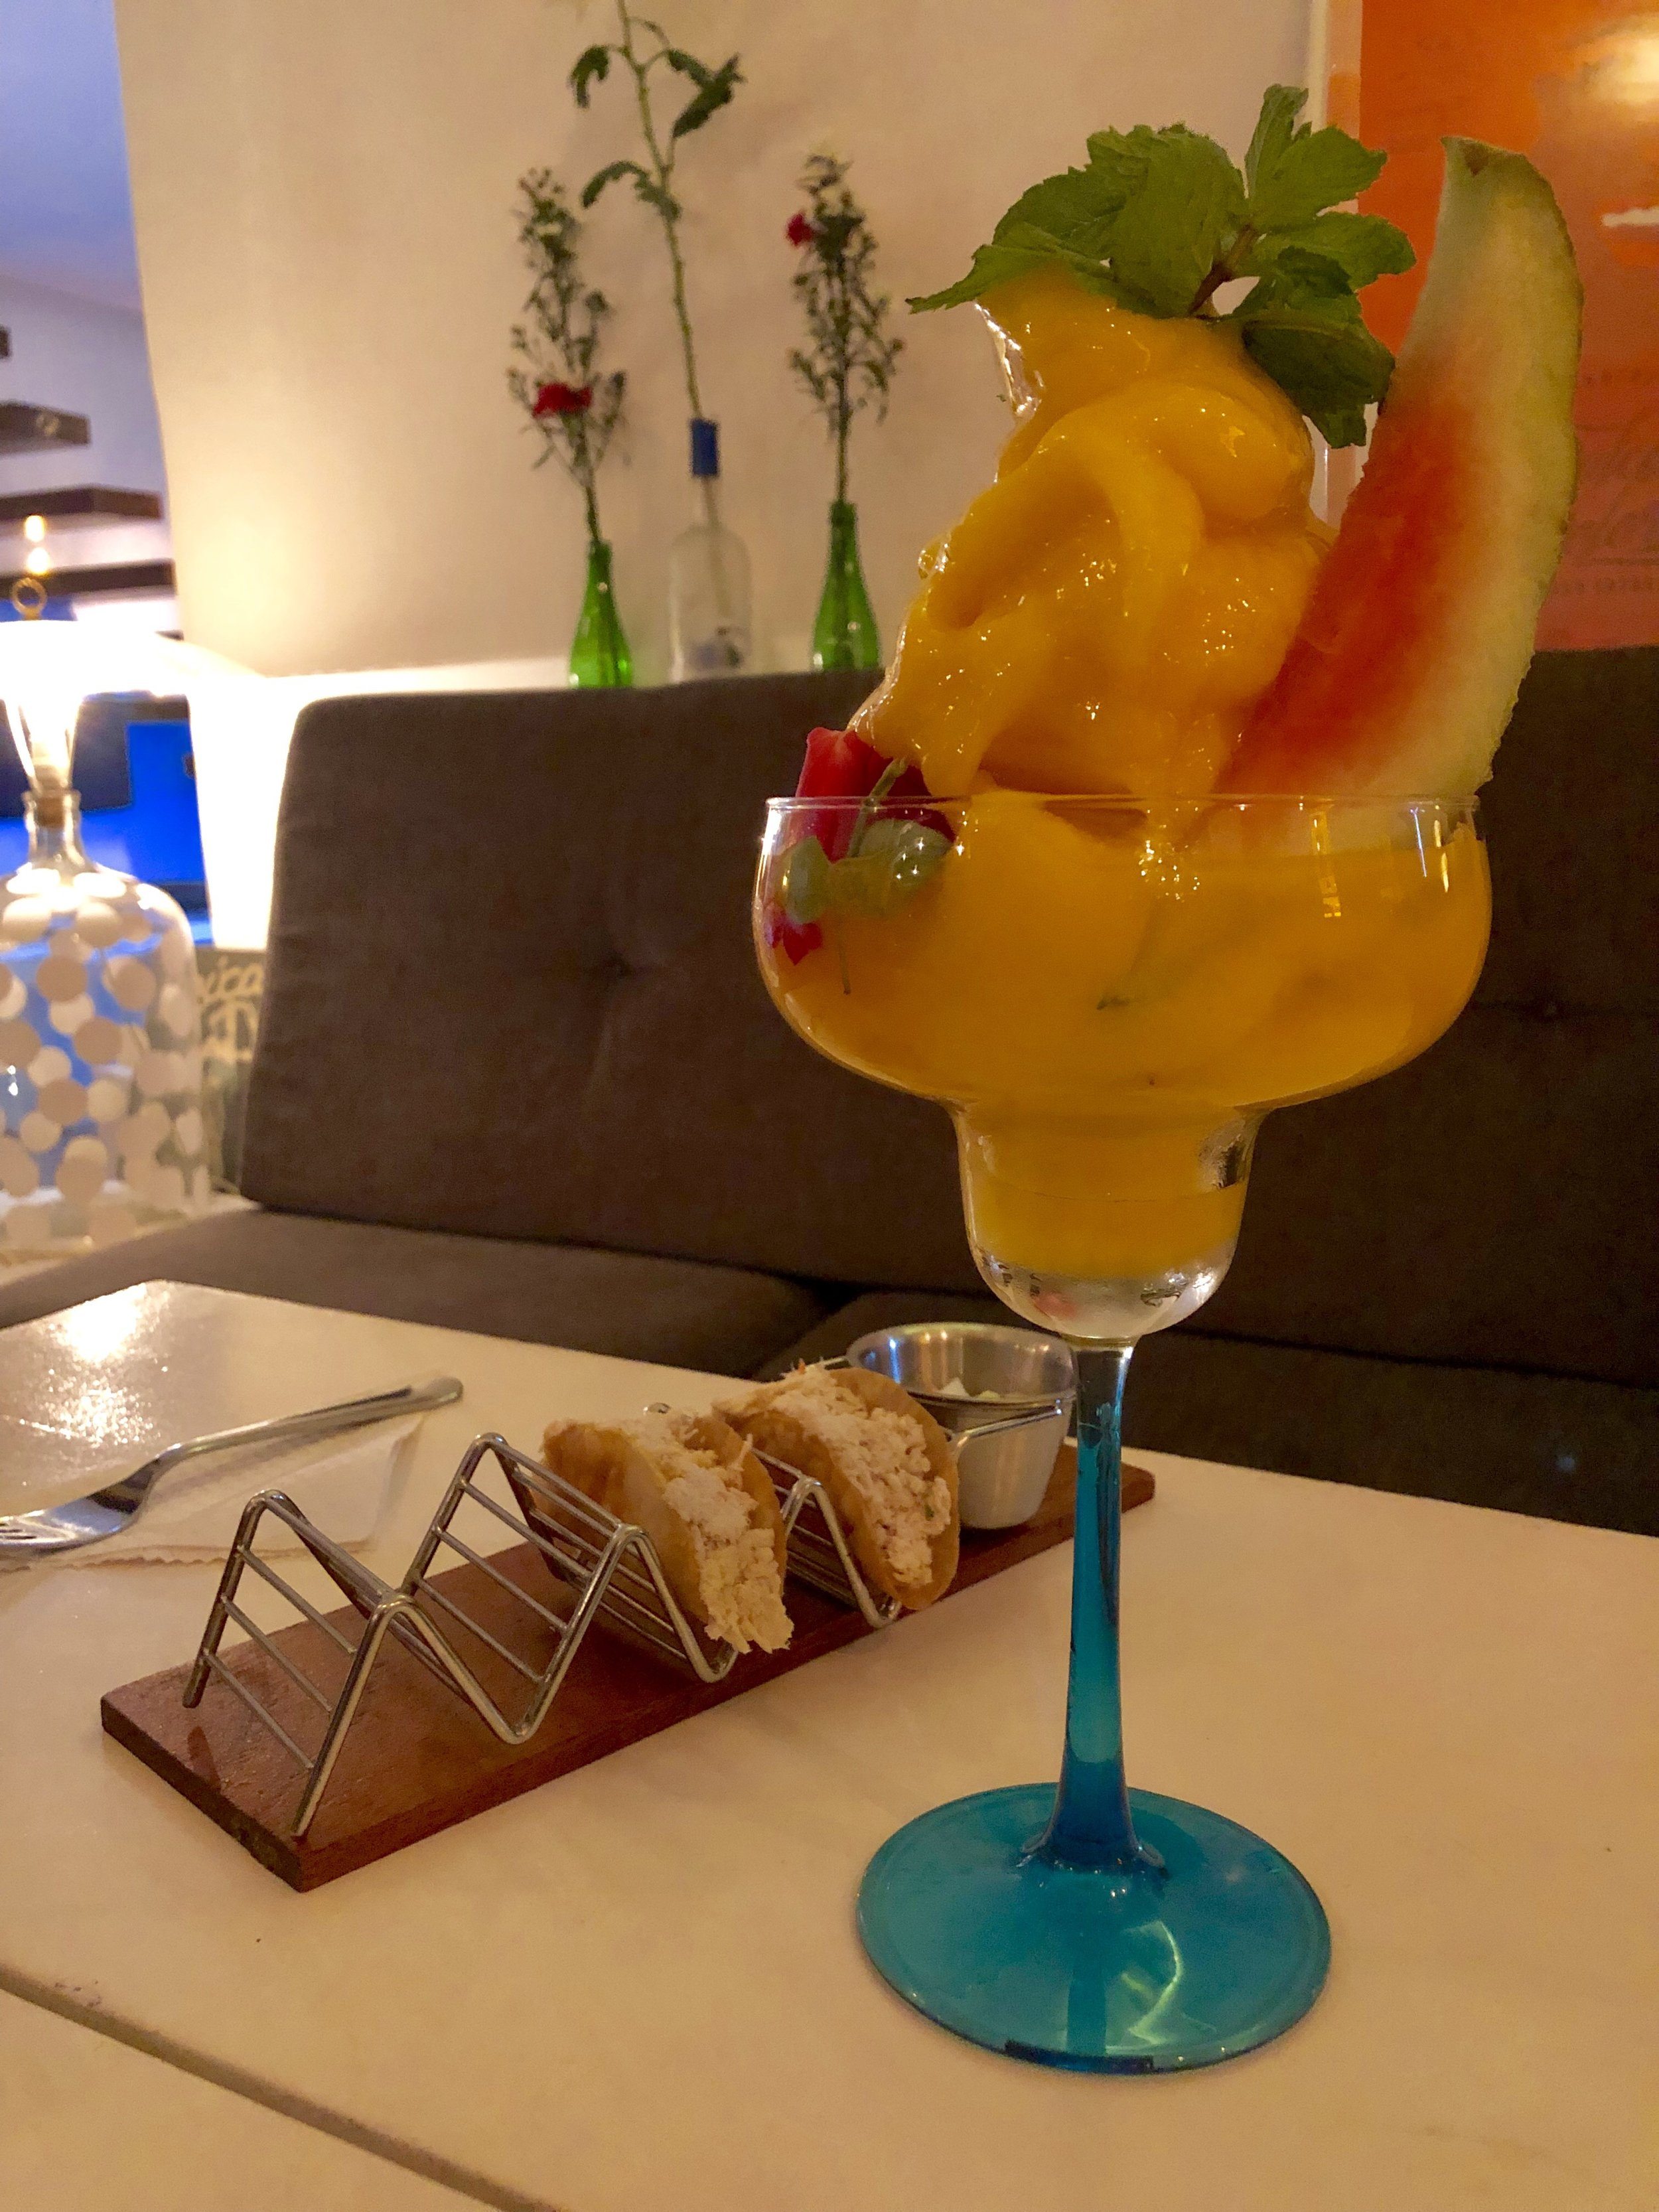 Cuba bars (Sugar bar, drink), Kaitlyn Alkass.jpeg